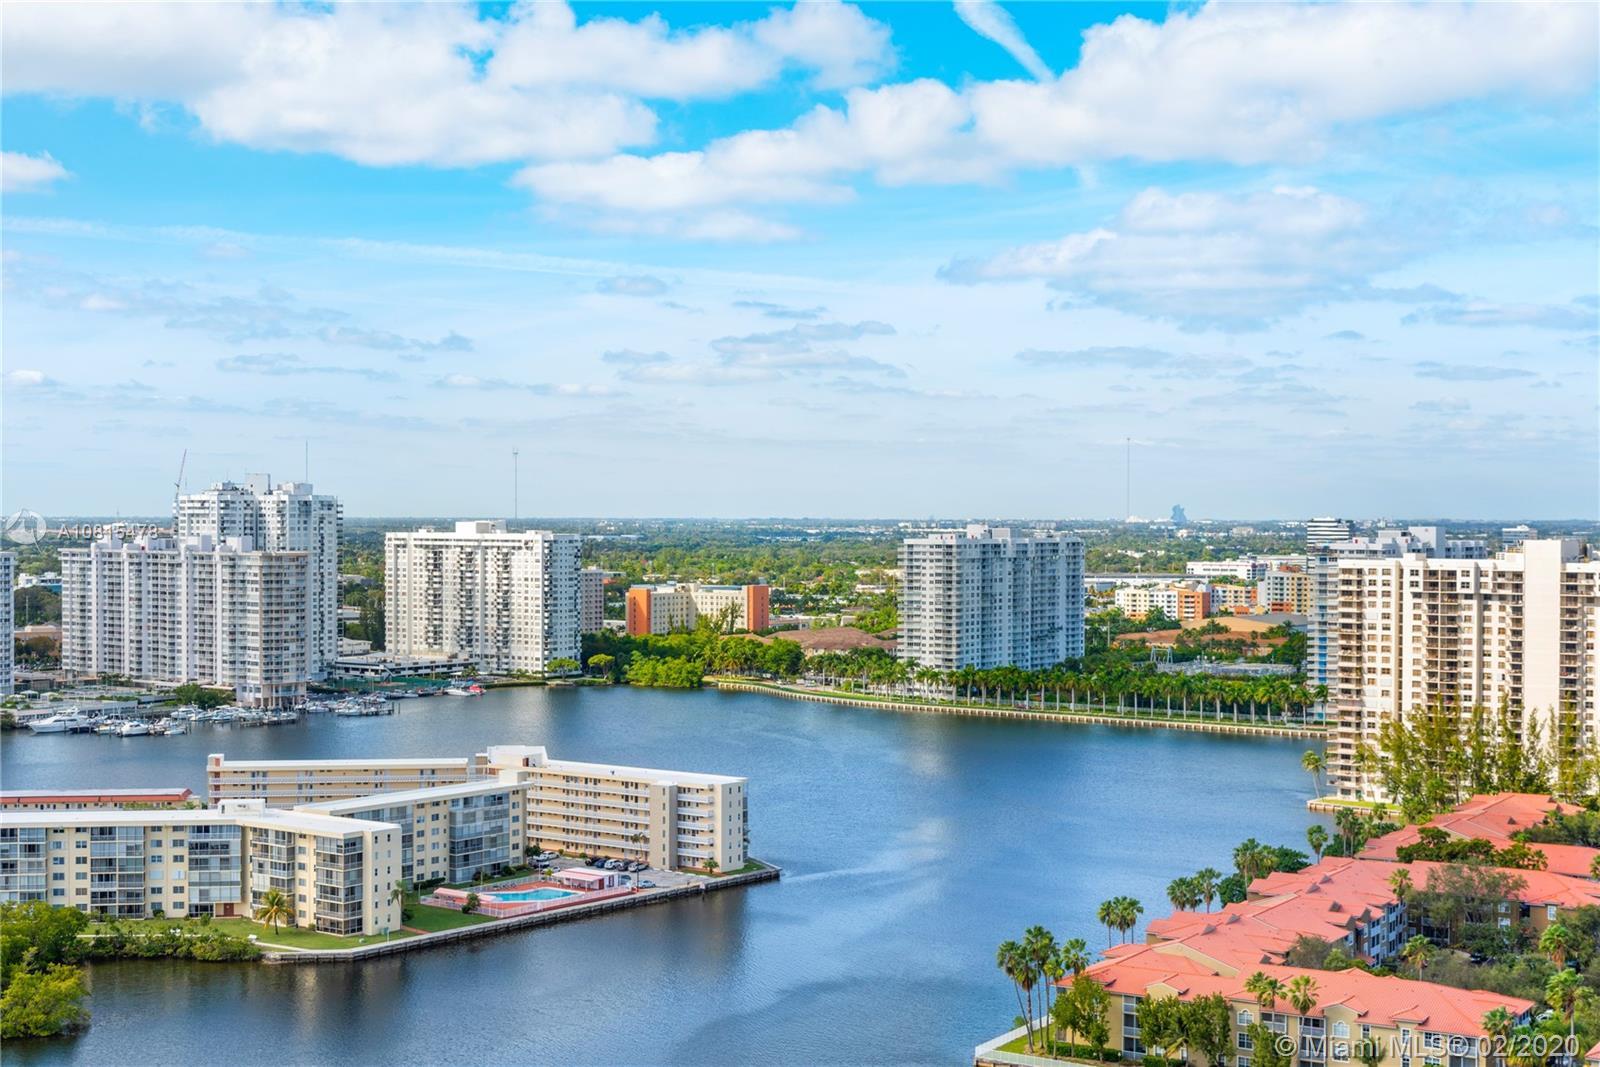 2000 Island Blvd #2507, Aventura, FL 33160 - Aventura, FL real estate listing